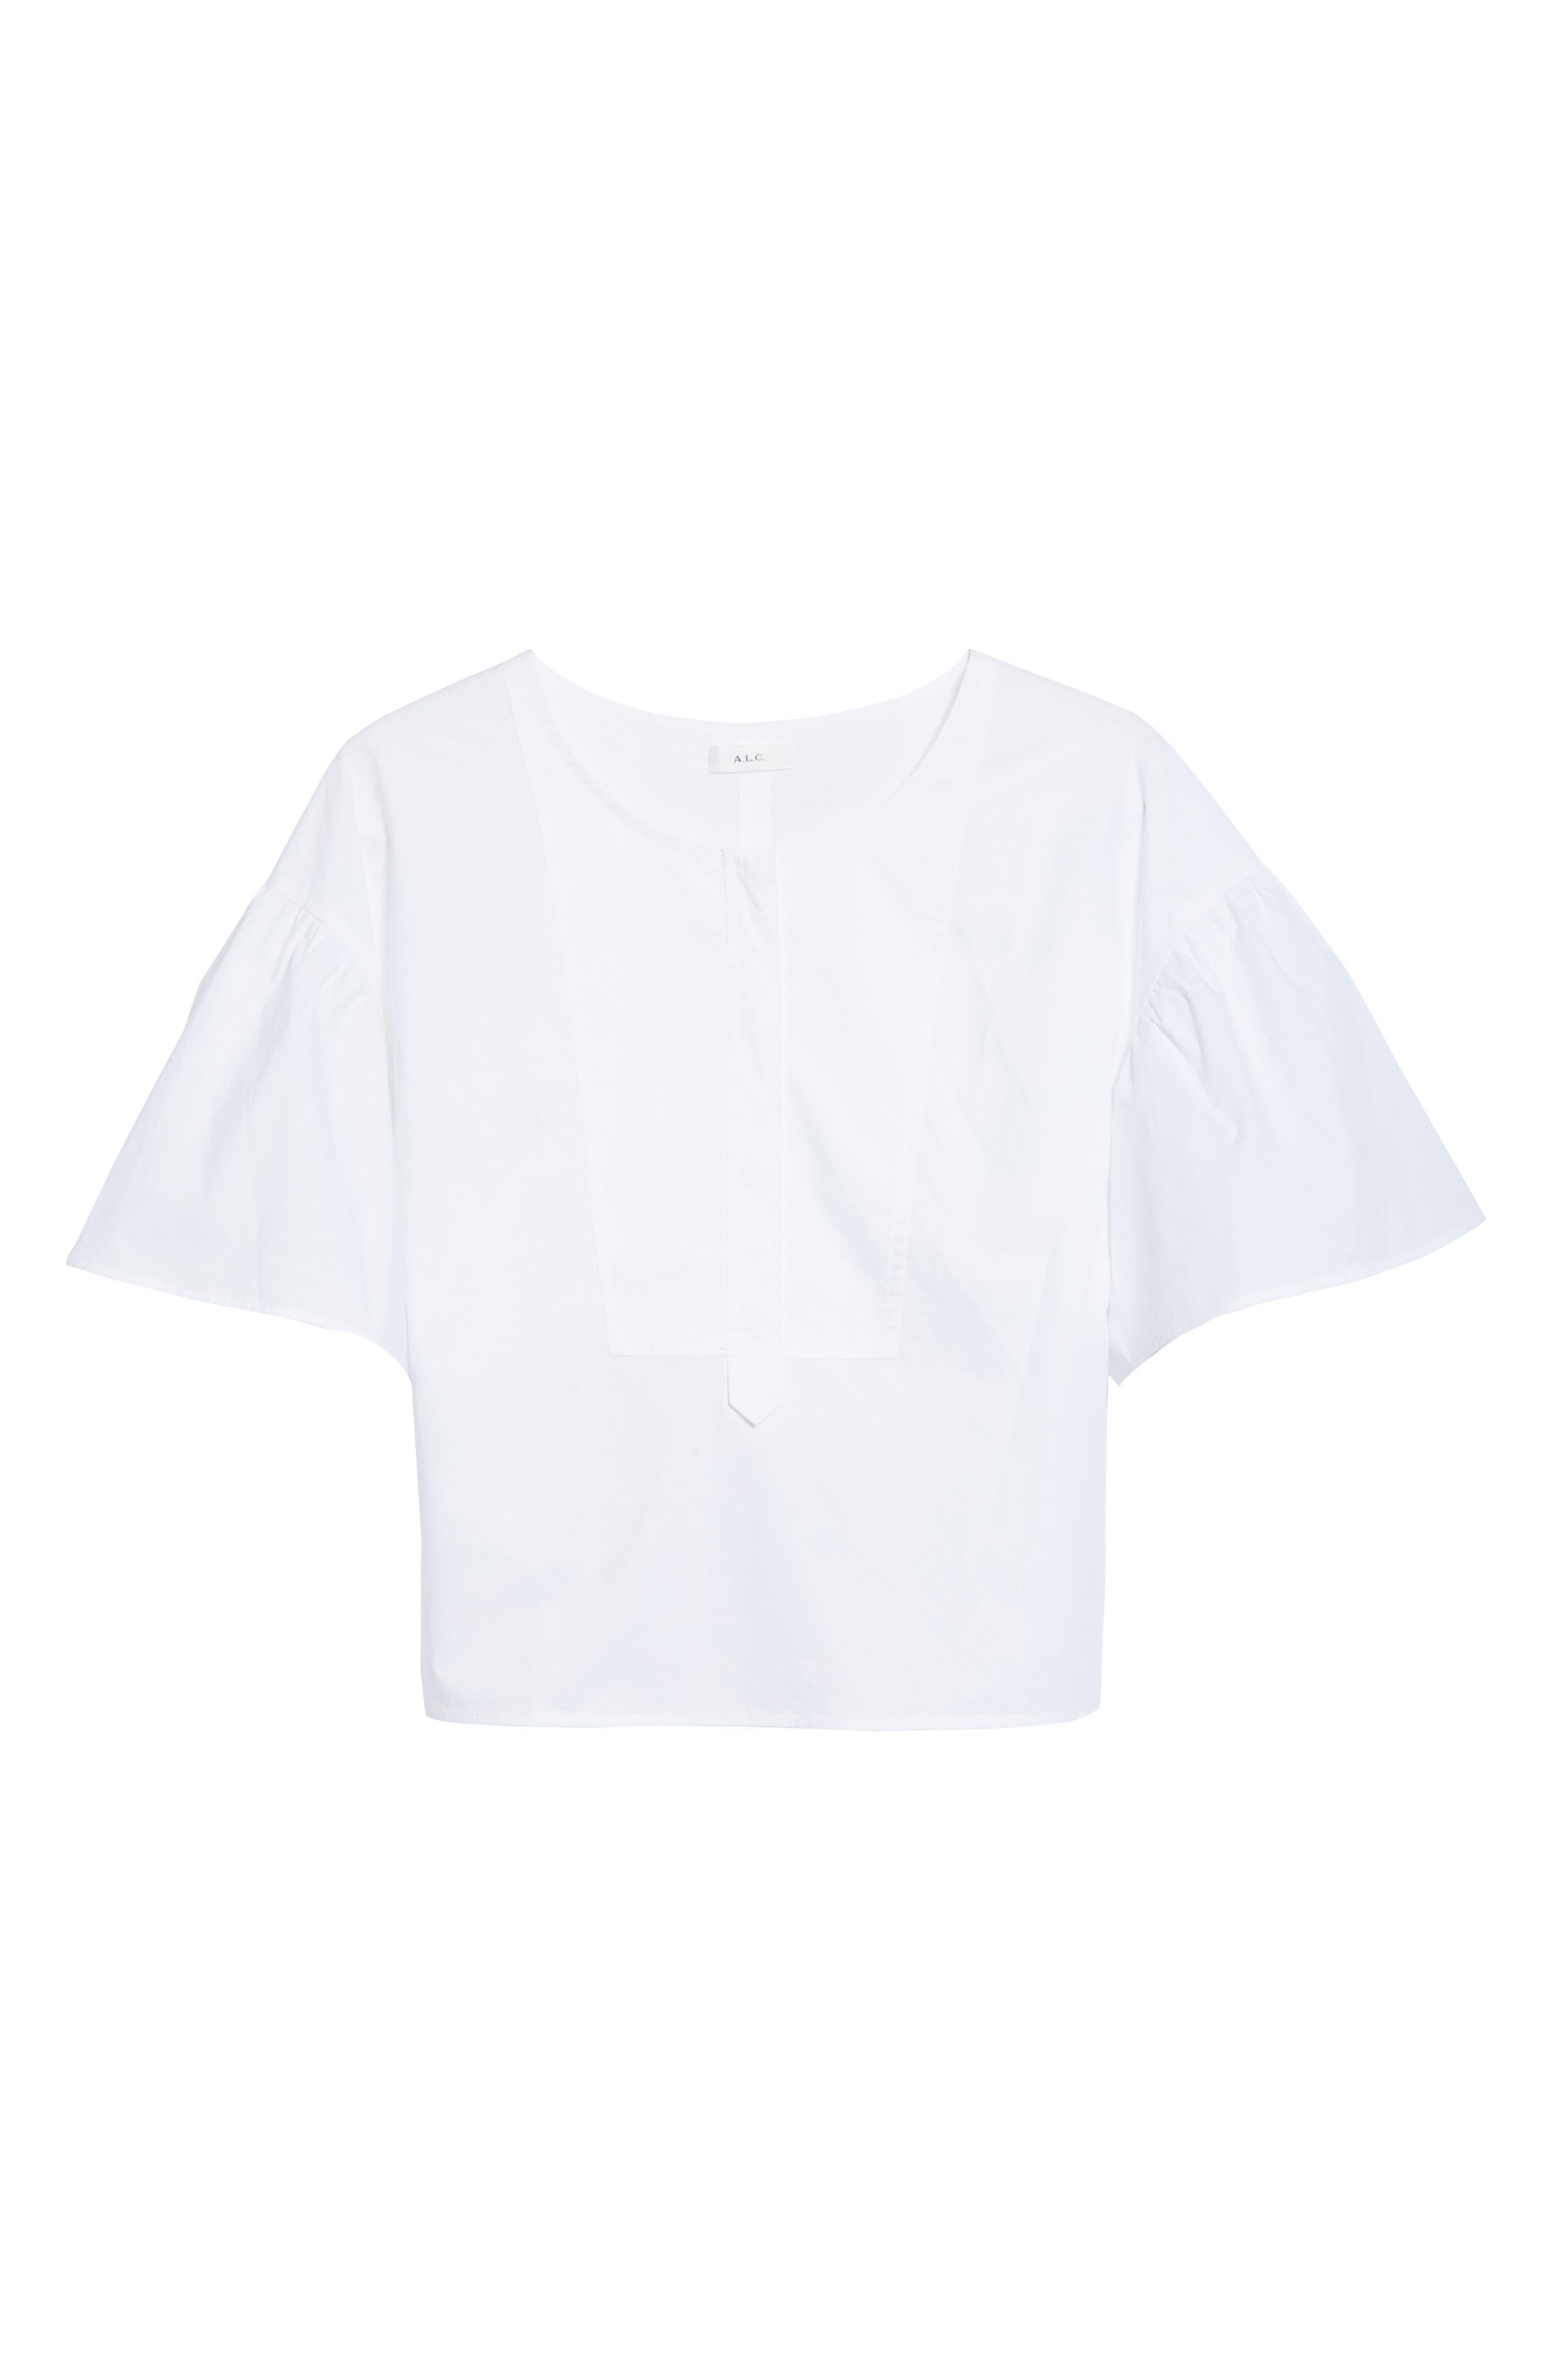 Kyrie Cotton Top,                             Alternate thumbnail 7, color,                             White